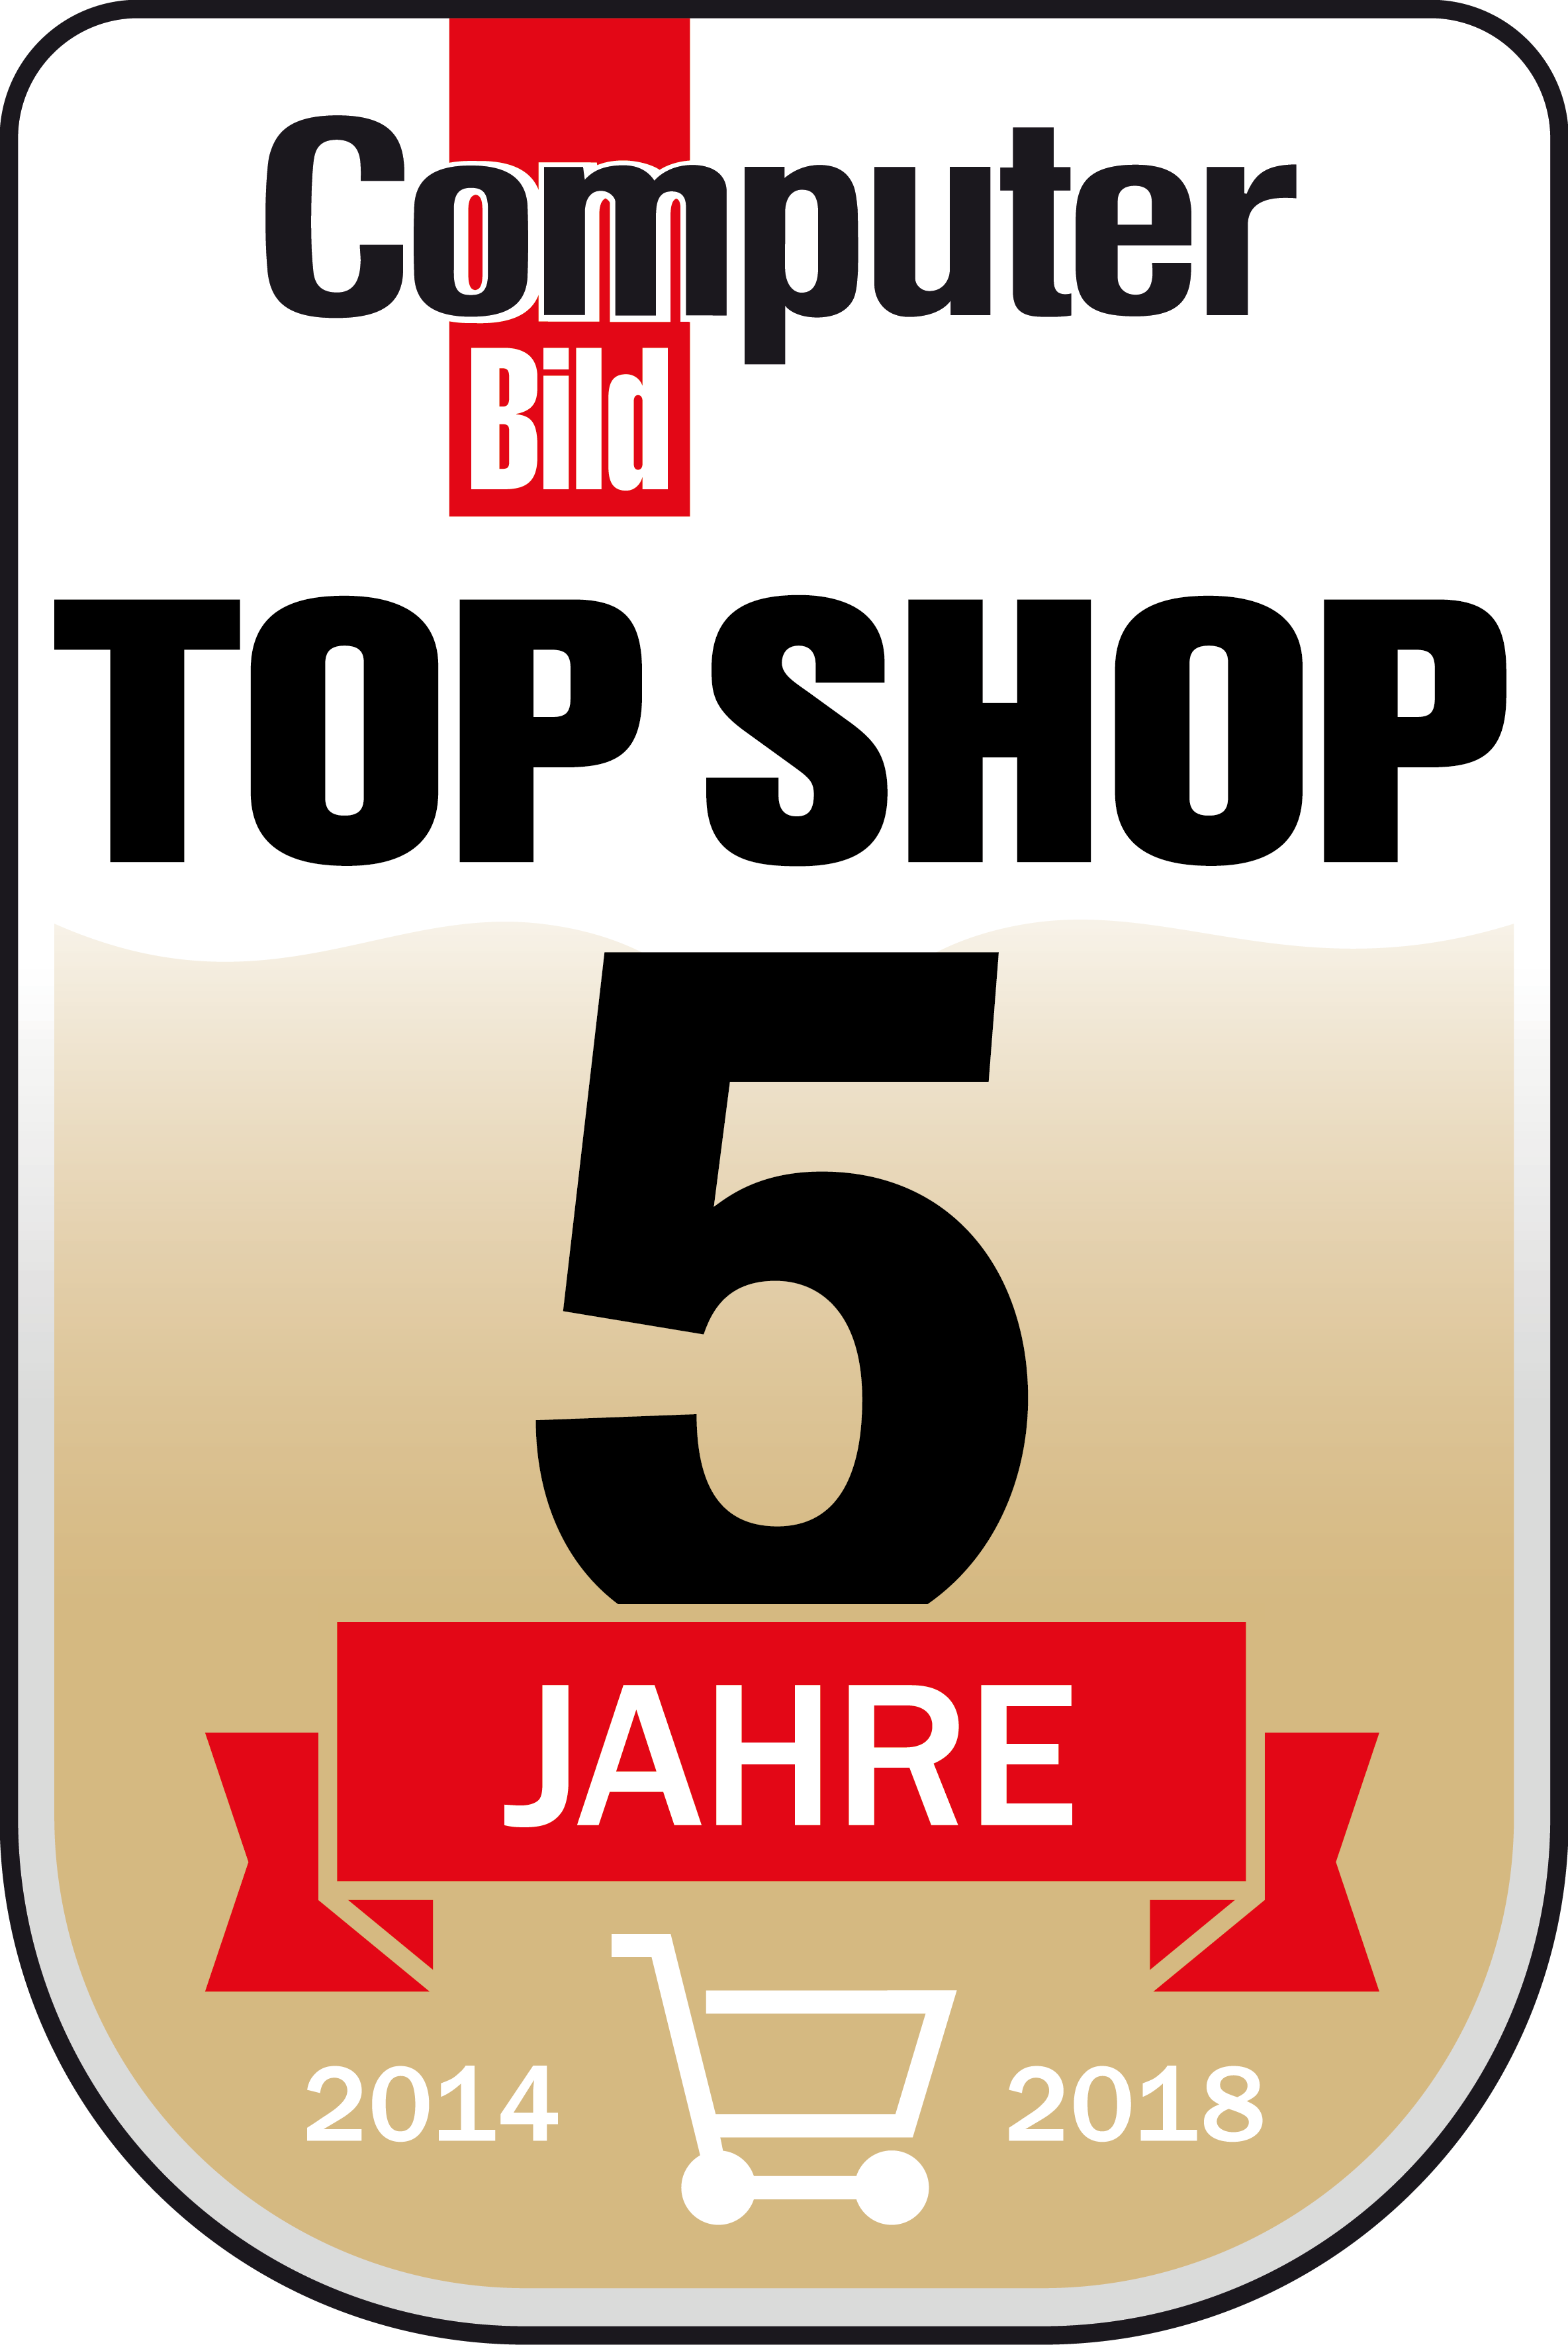 Top Shop - 5 Jahre